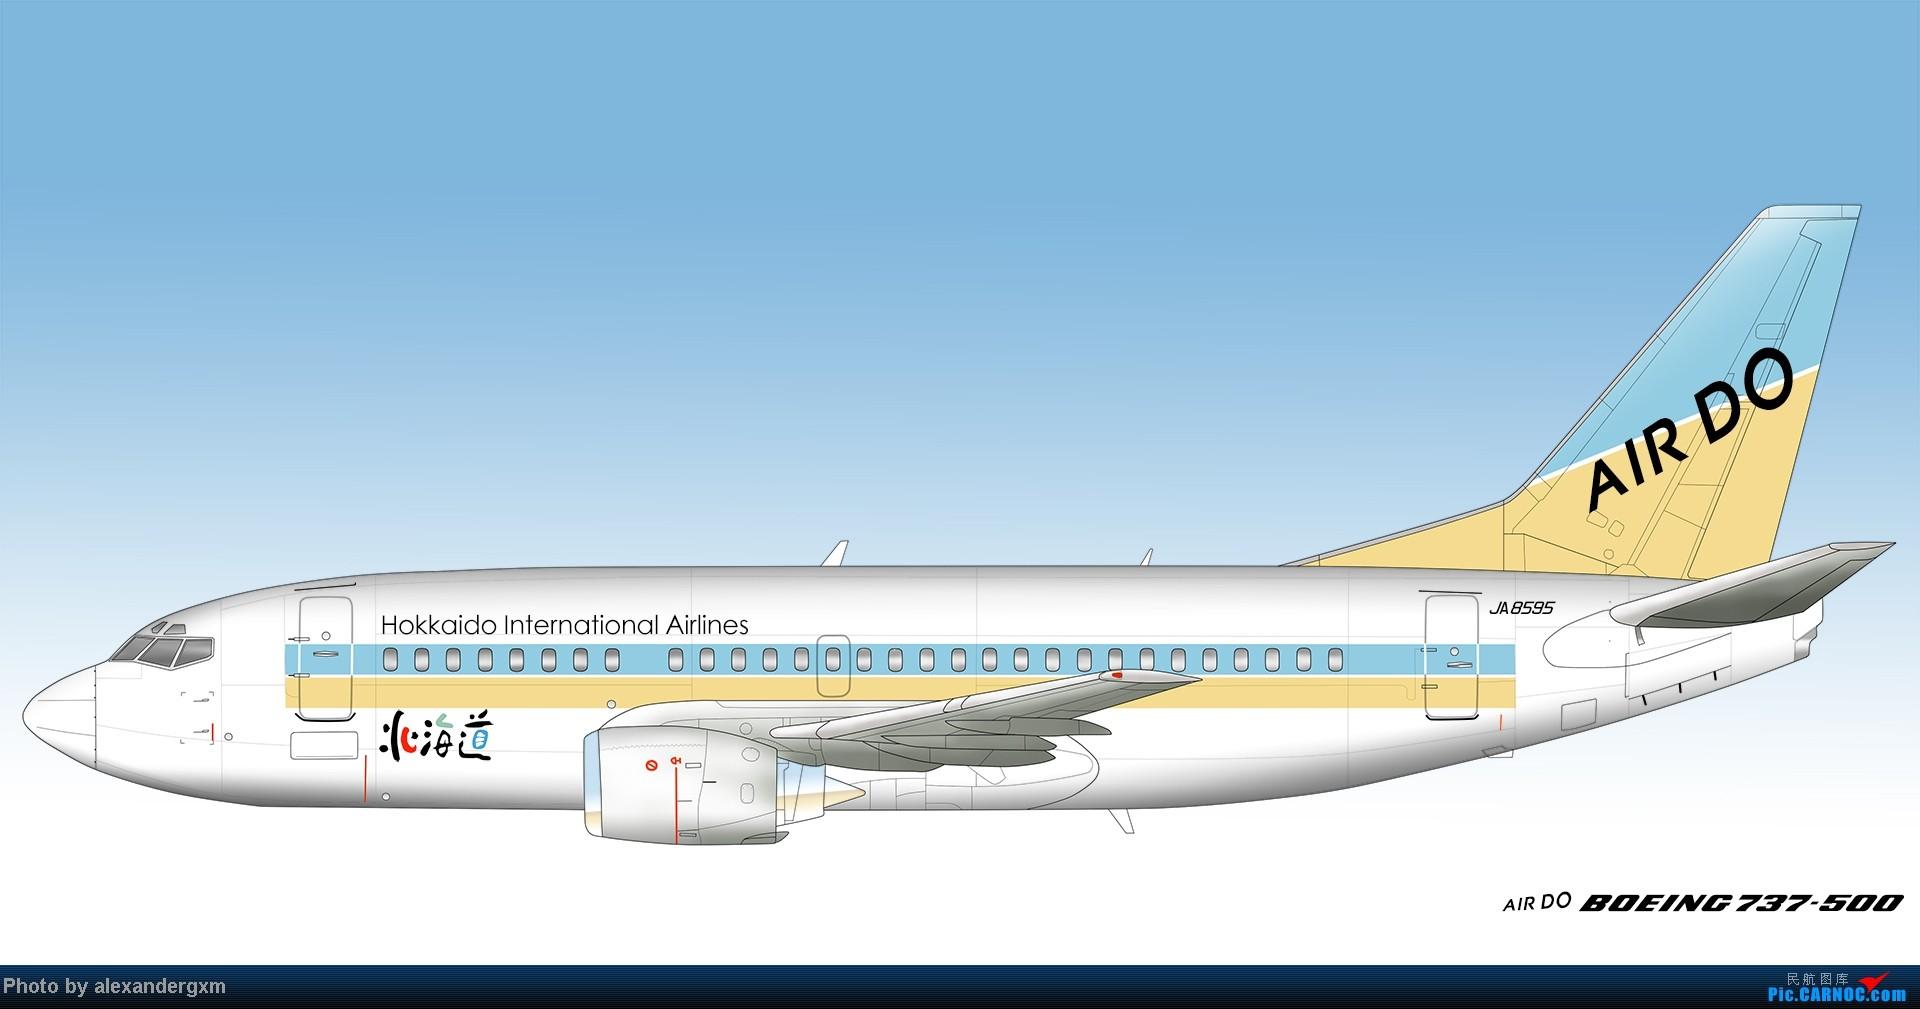 Re:[原创]发一些自己业余画的一些飞机啦~大部分侧视图~ 737-500